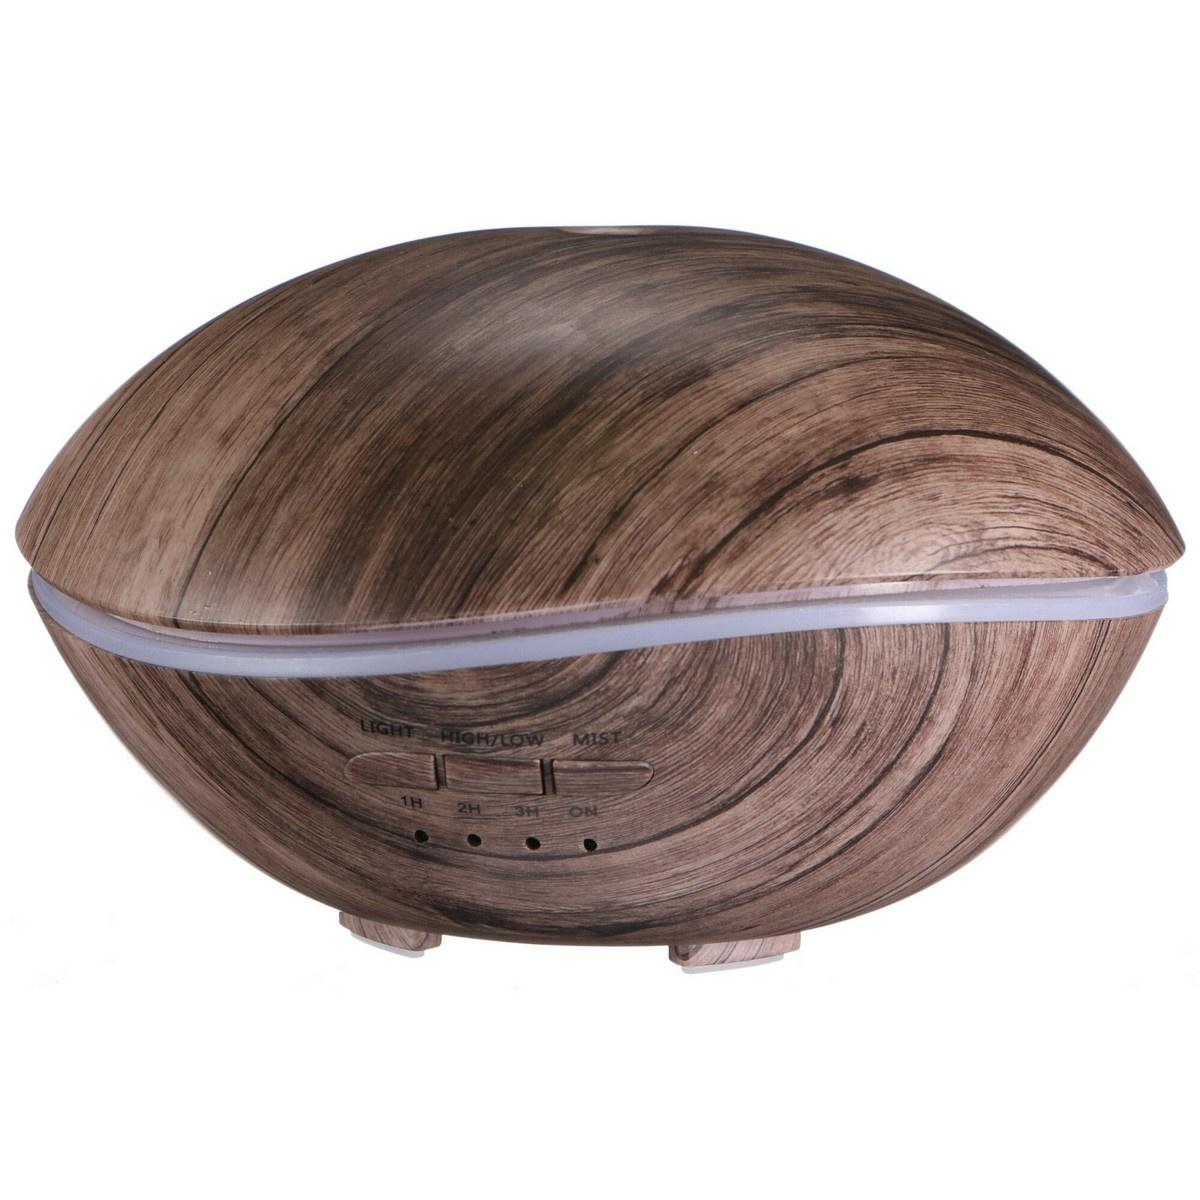 Sixtol Aróma difuzér Stone sivé drevo, 500 ml,